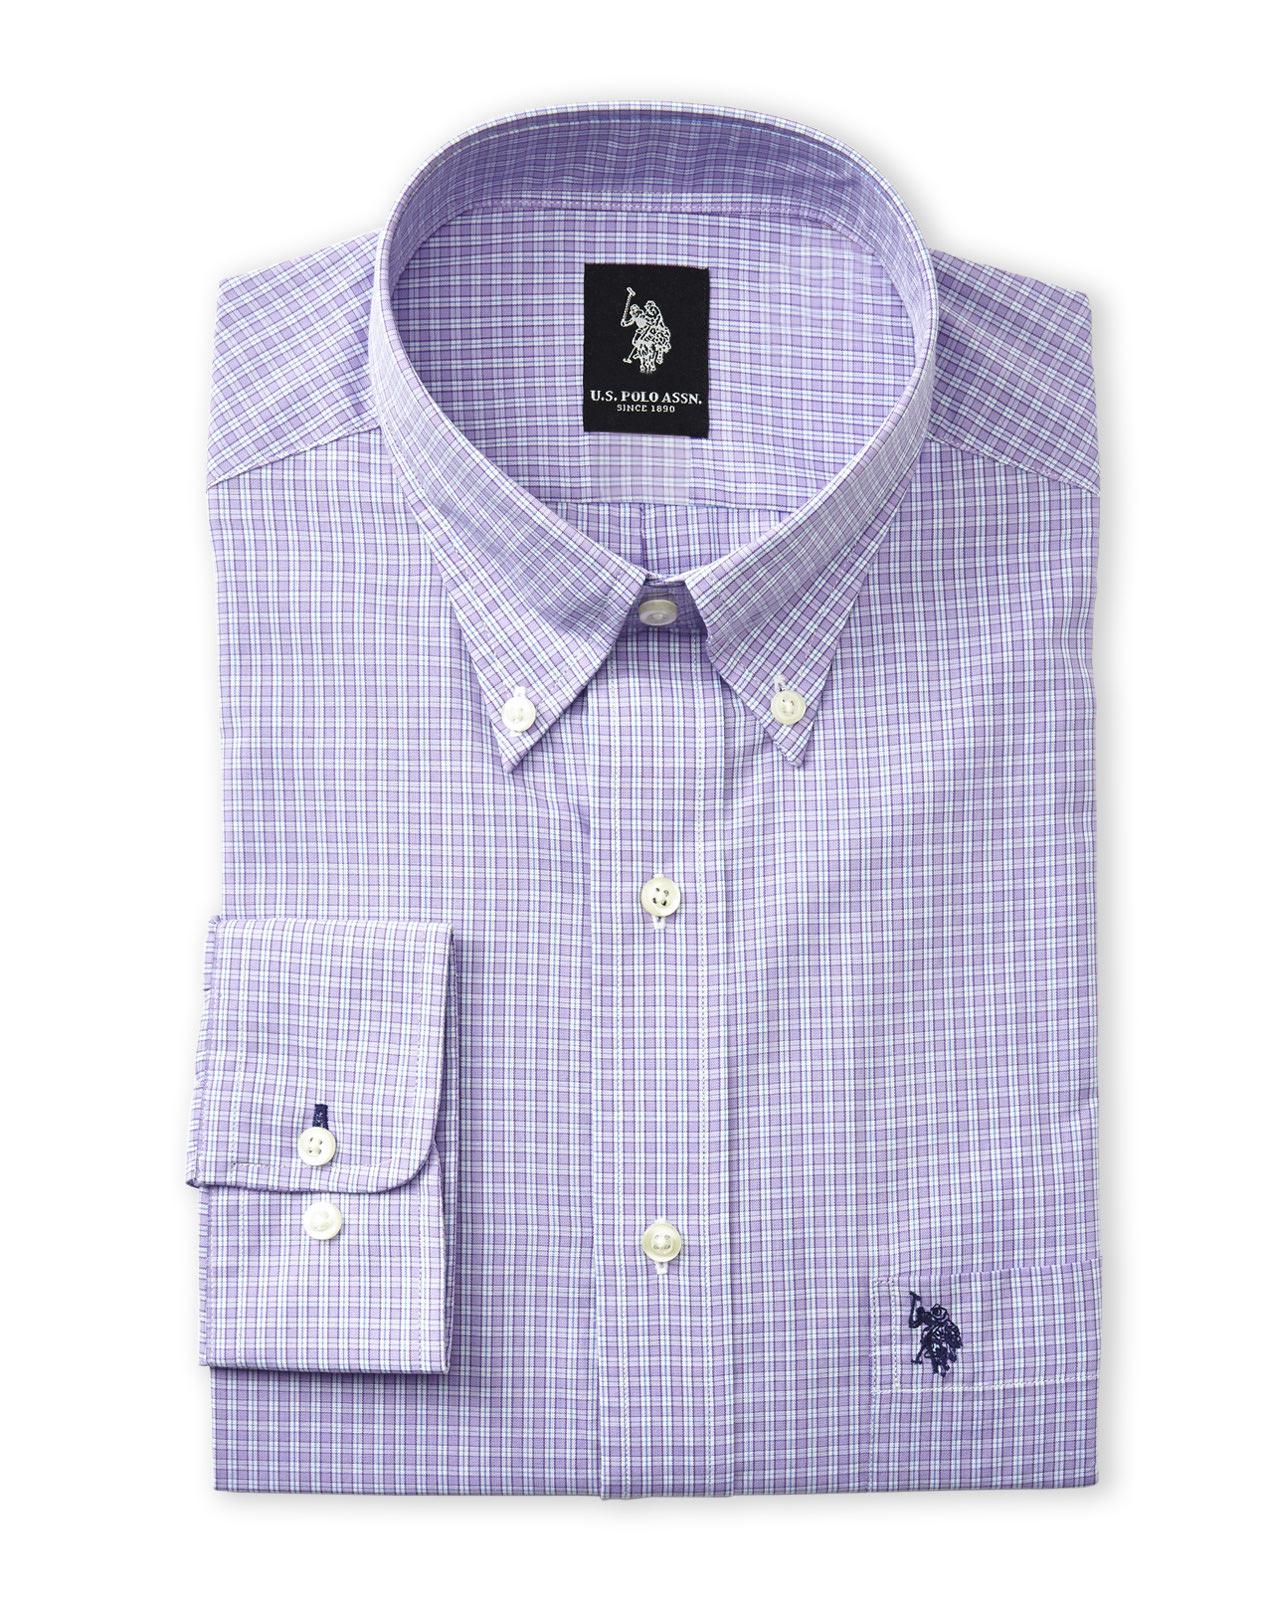 Us polo assn men 39 s long sleeve dress shirt here 39 s what for Purple polo uniform shirts